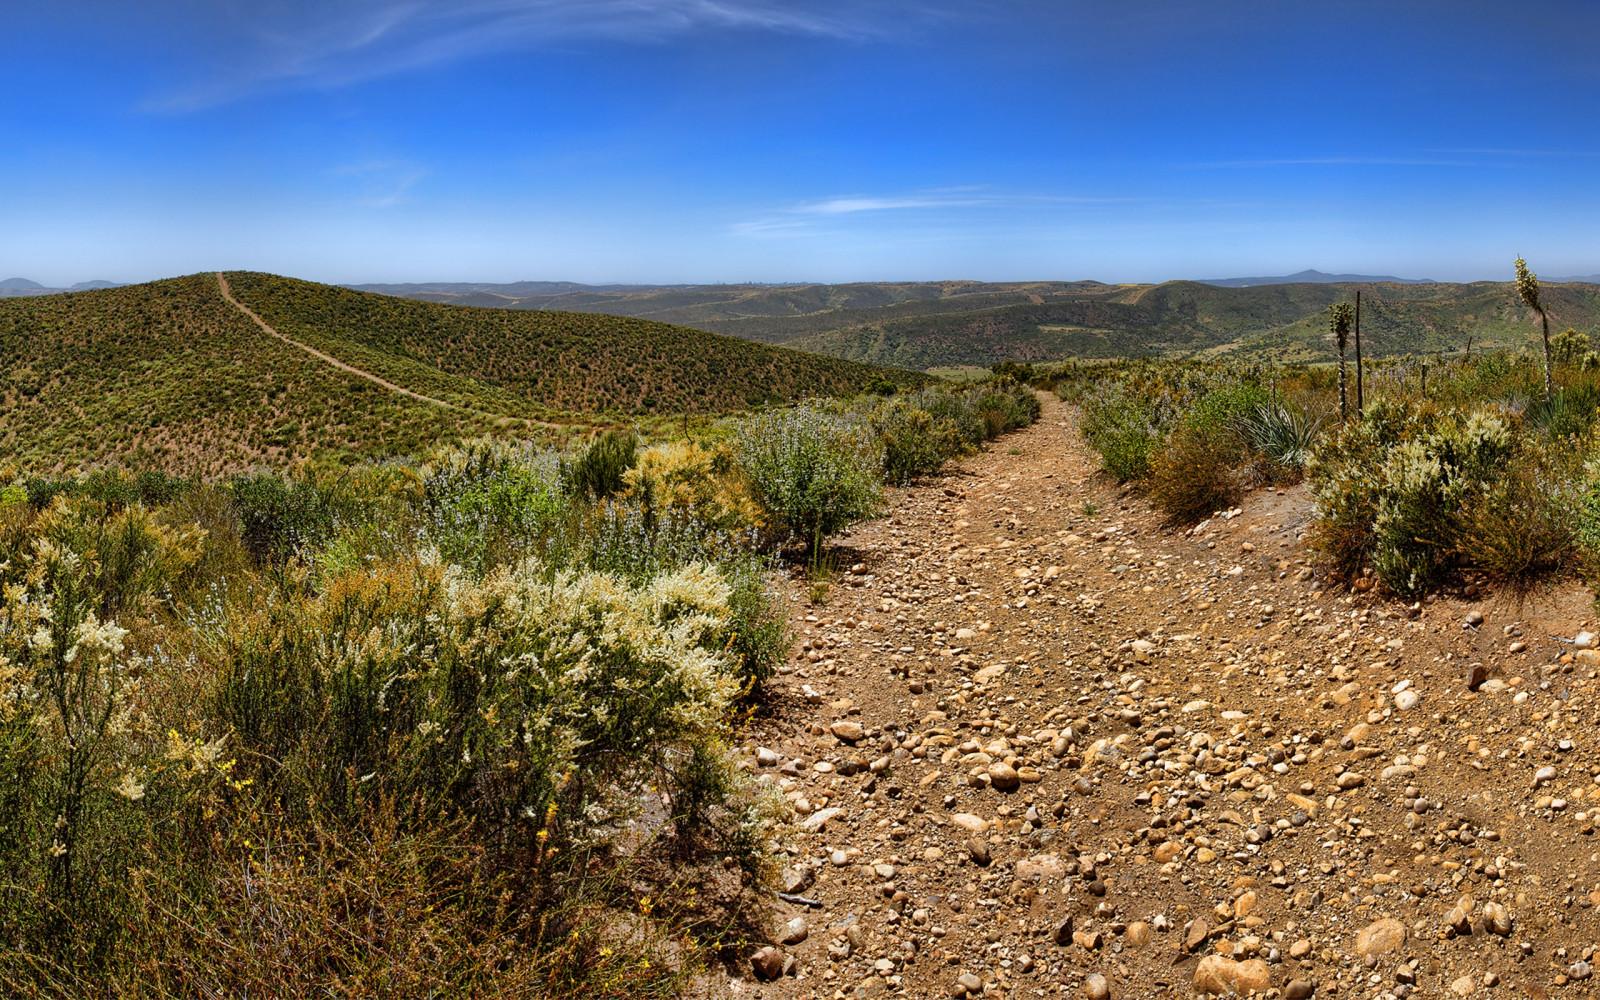 Wallpaper Pemandangan Bidang Gurun Jalan Tanah California